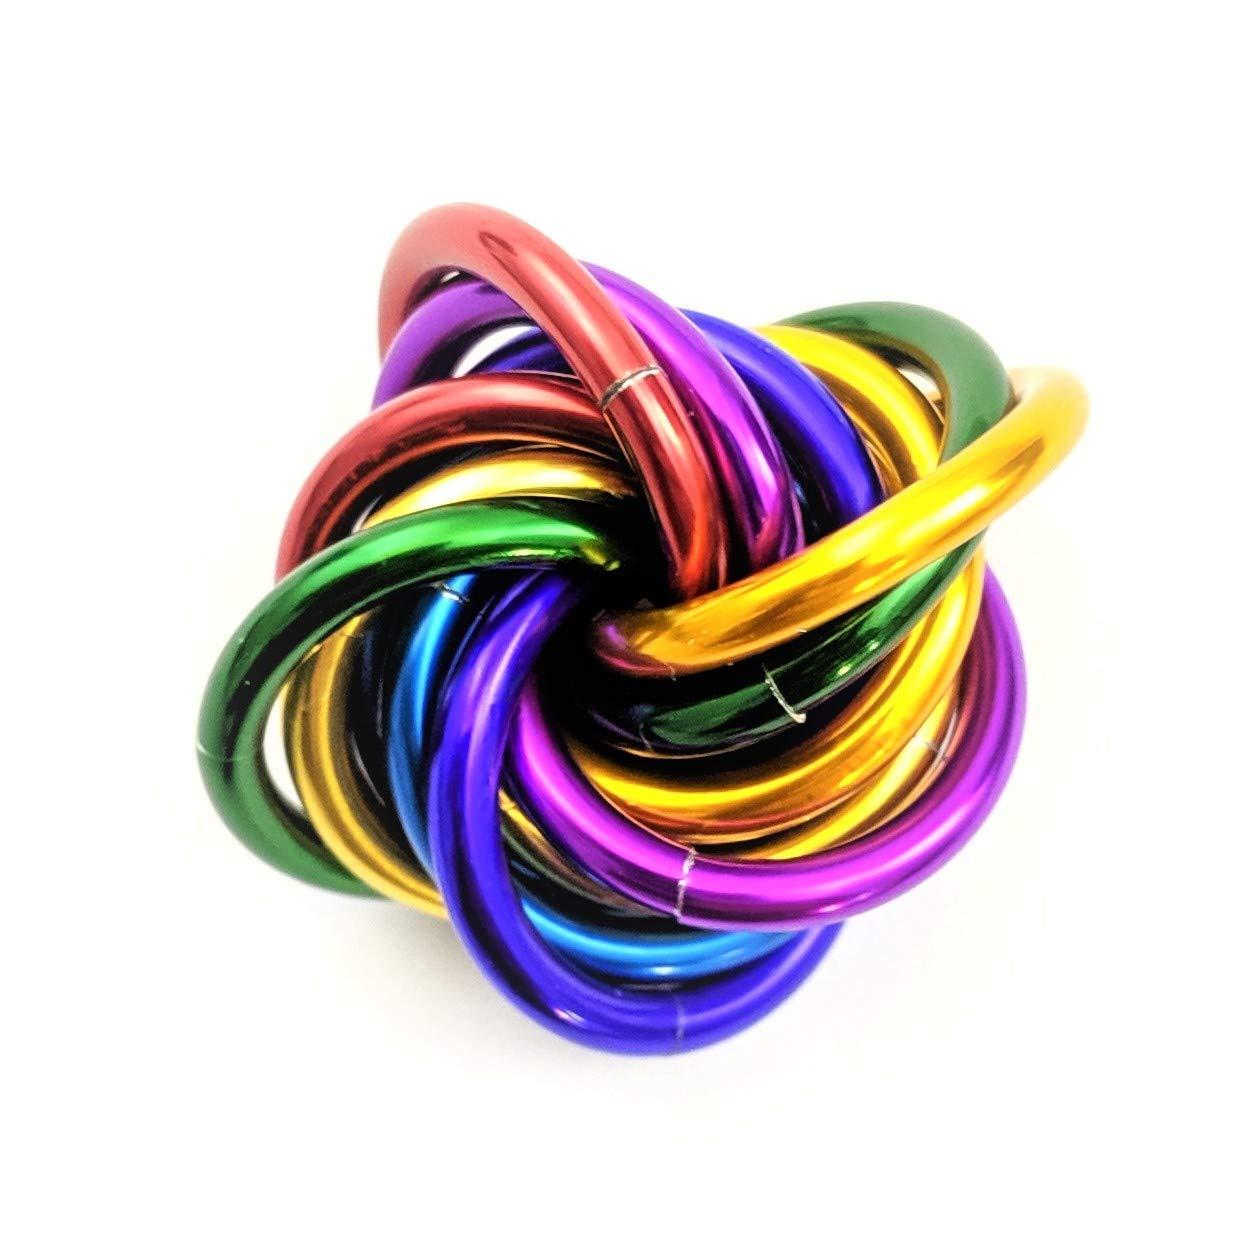 Office Stim Mobii Rainbow School Stress Ball for Restless Hands Medium Mobius Fidget Ball Toy